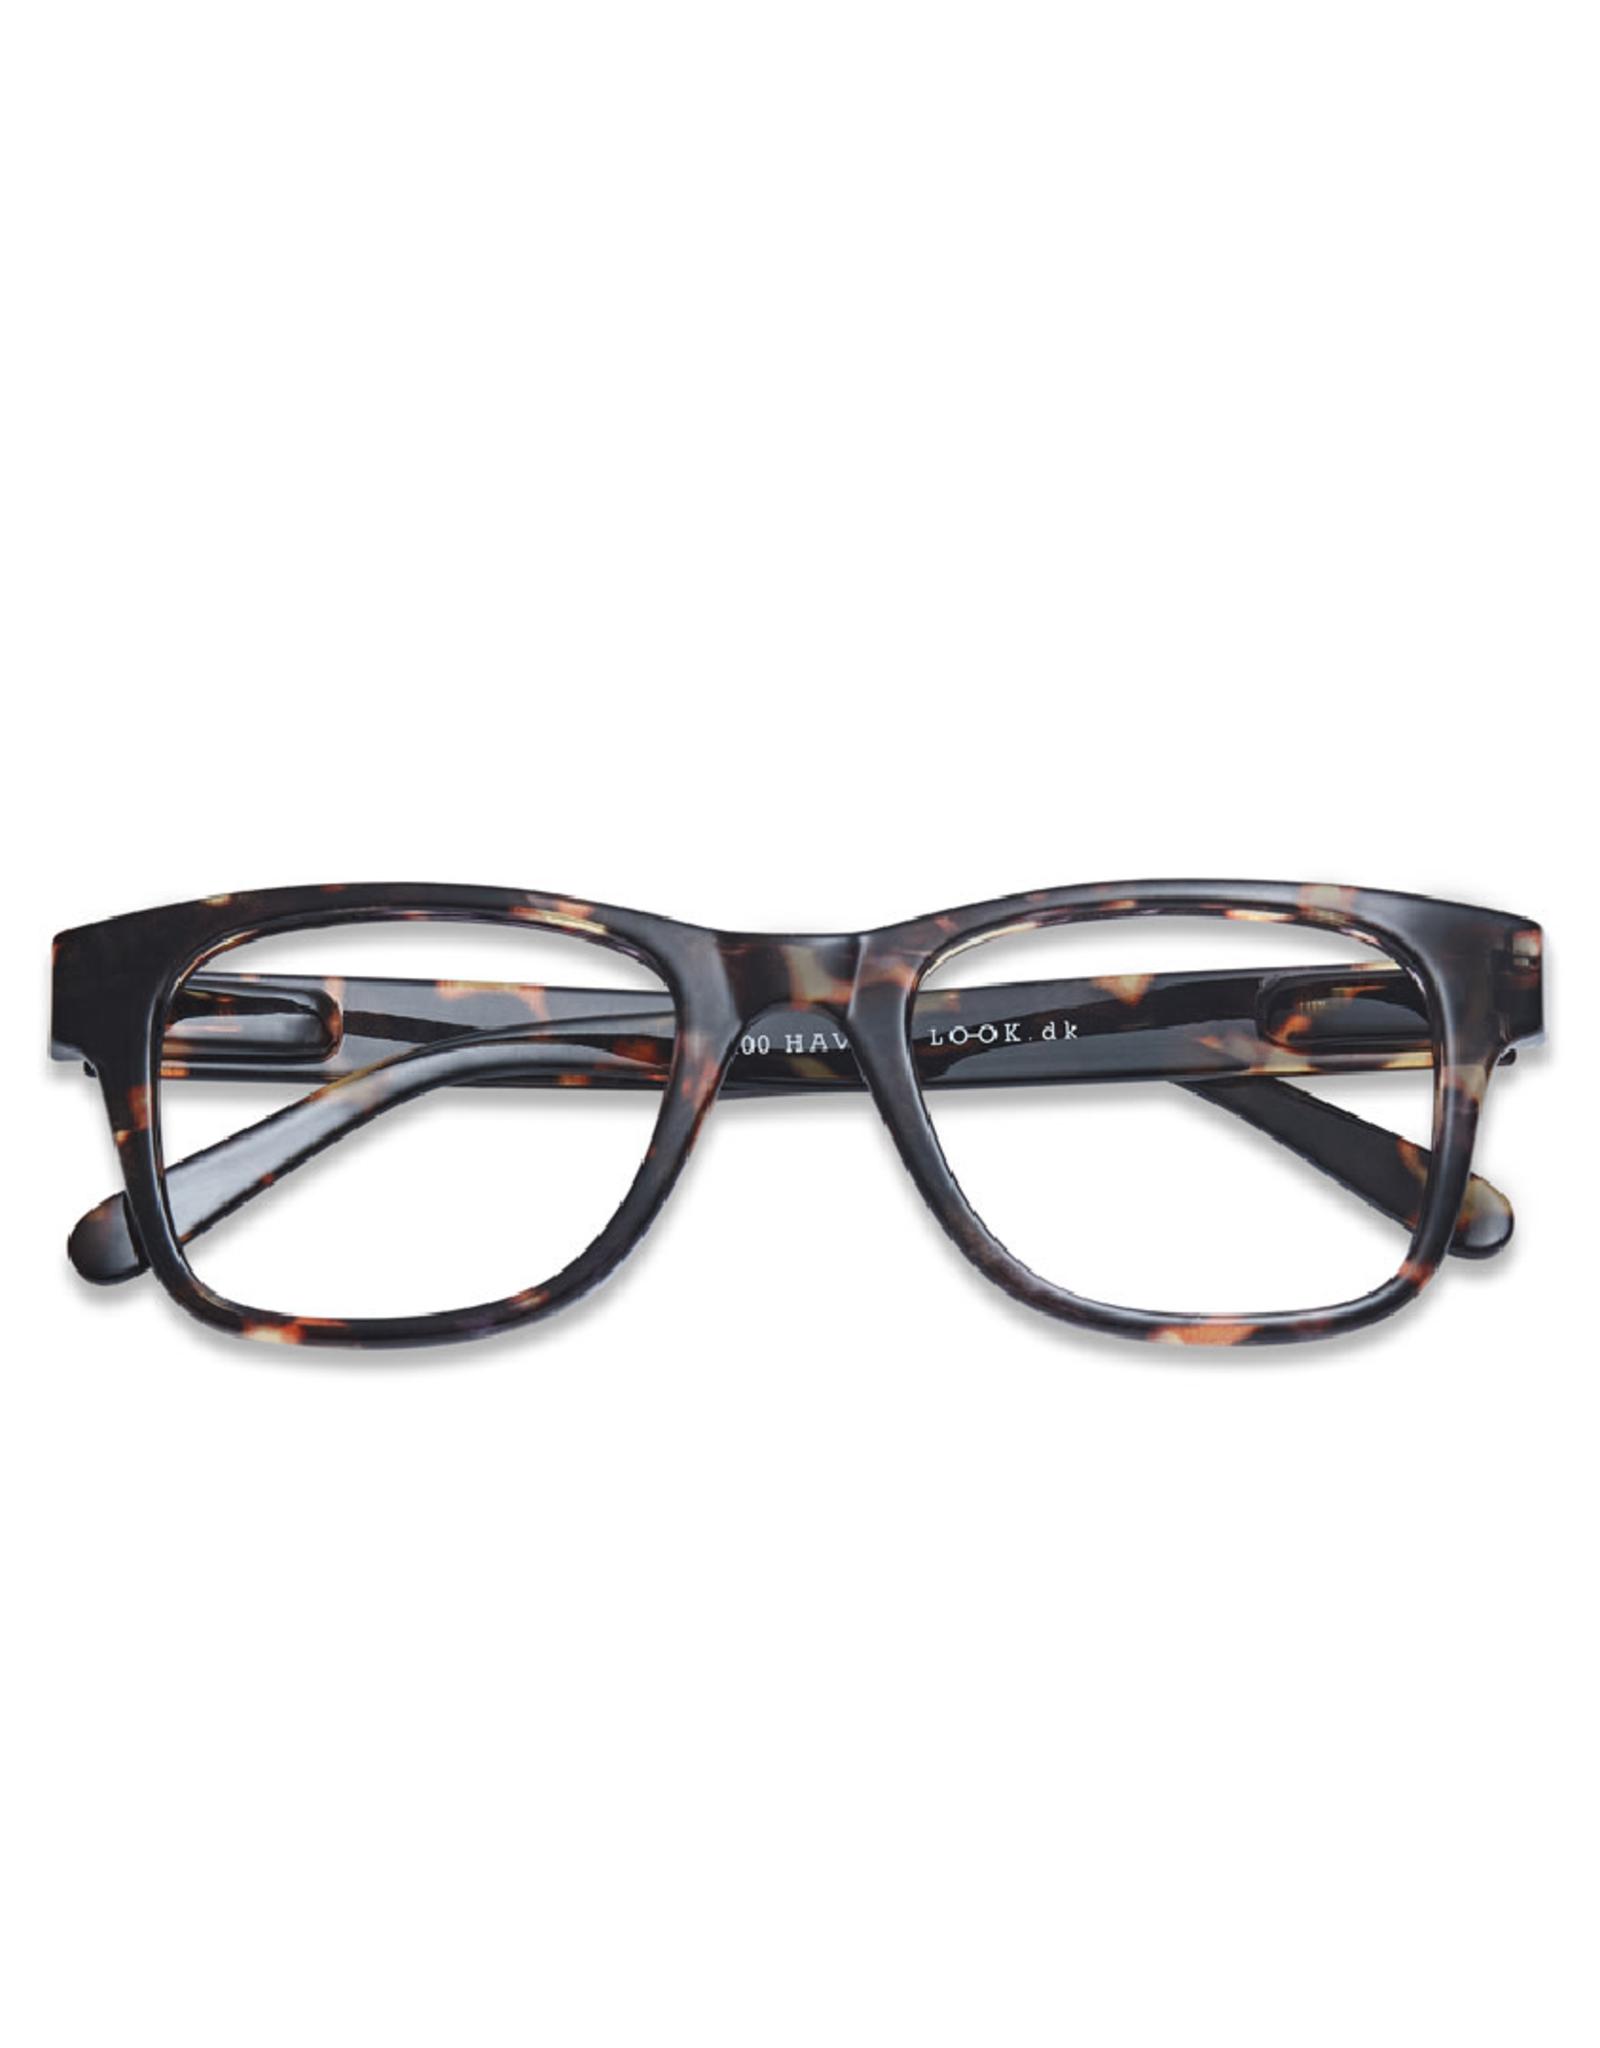 Leesbril Type B schilpaddesign